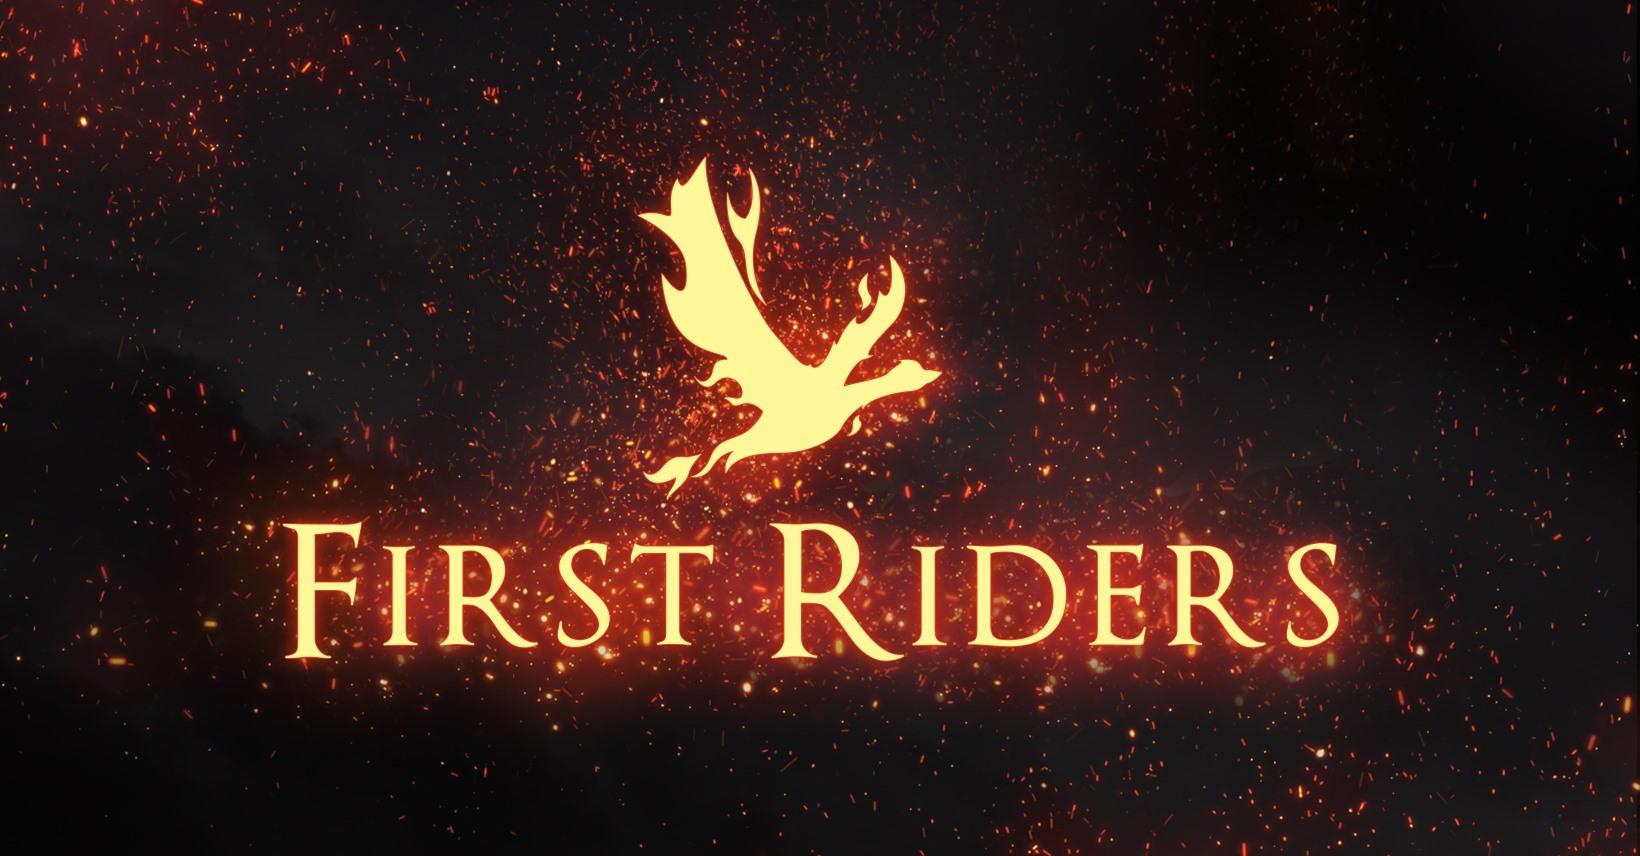 FirstRiders.jpg